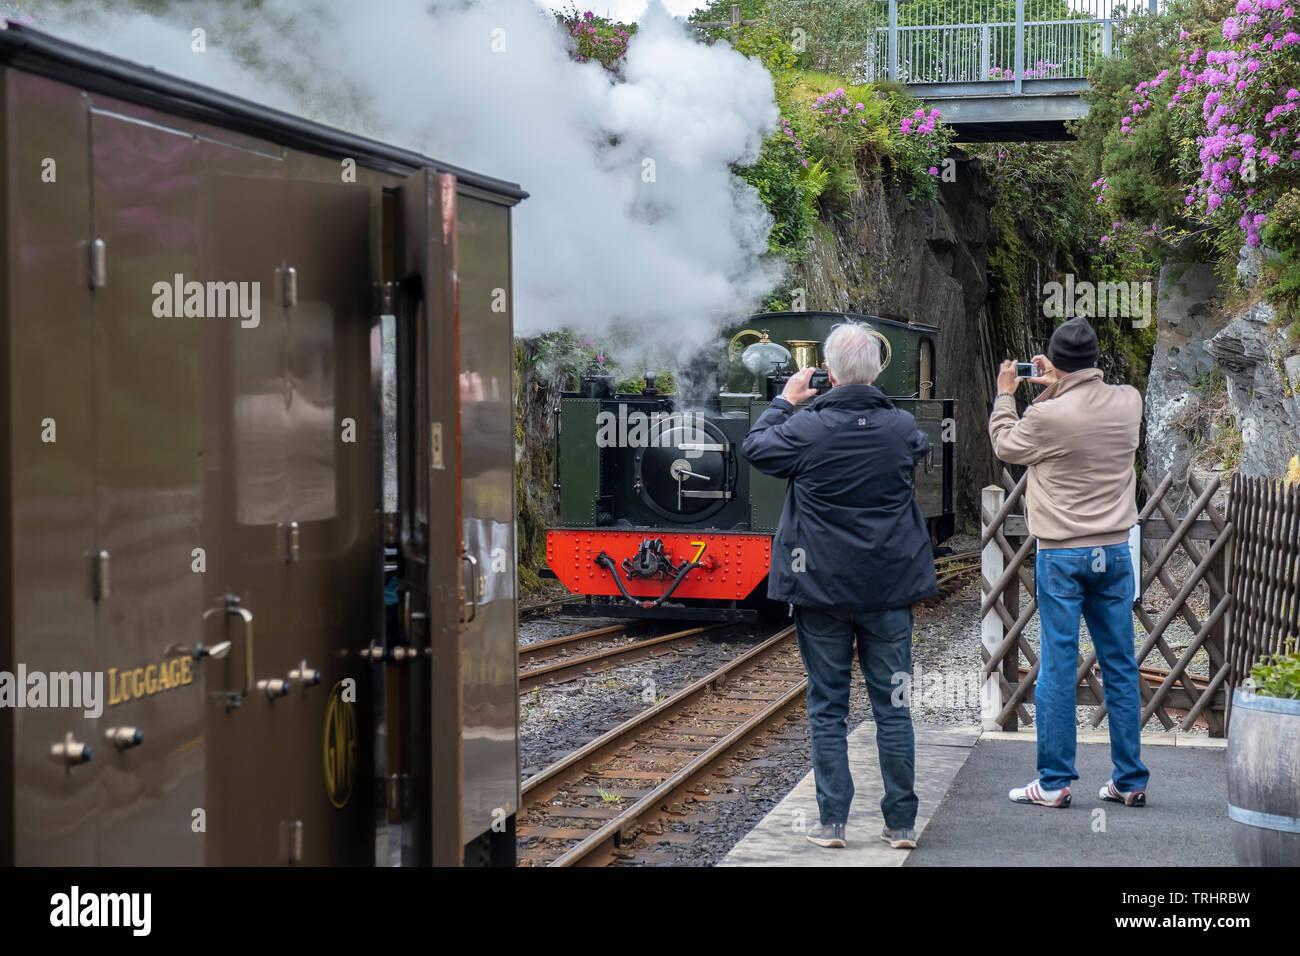 Tourists at platform, Vale of Rheidol Steam Railway, Devil's Bridge Station, Wales - Stock Image